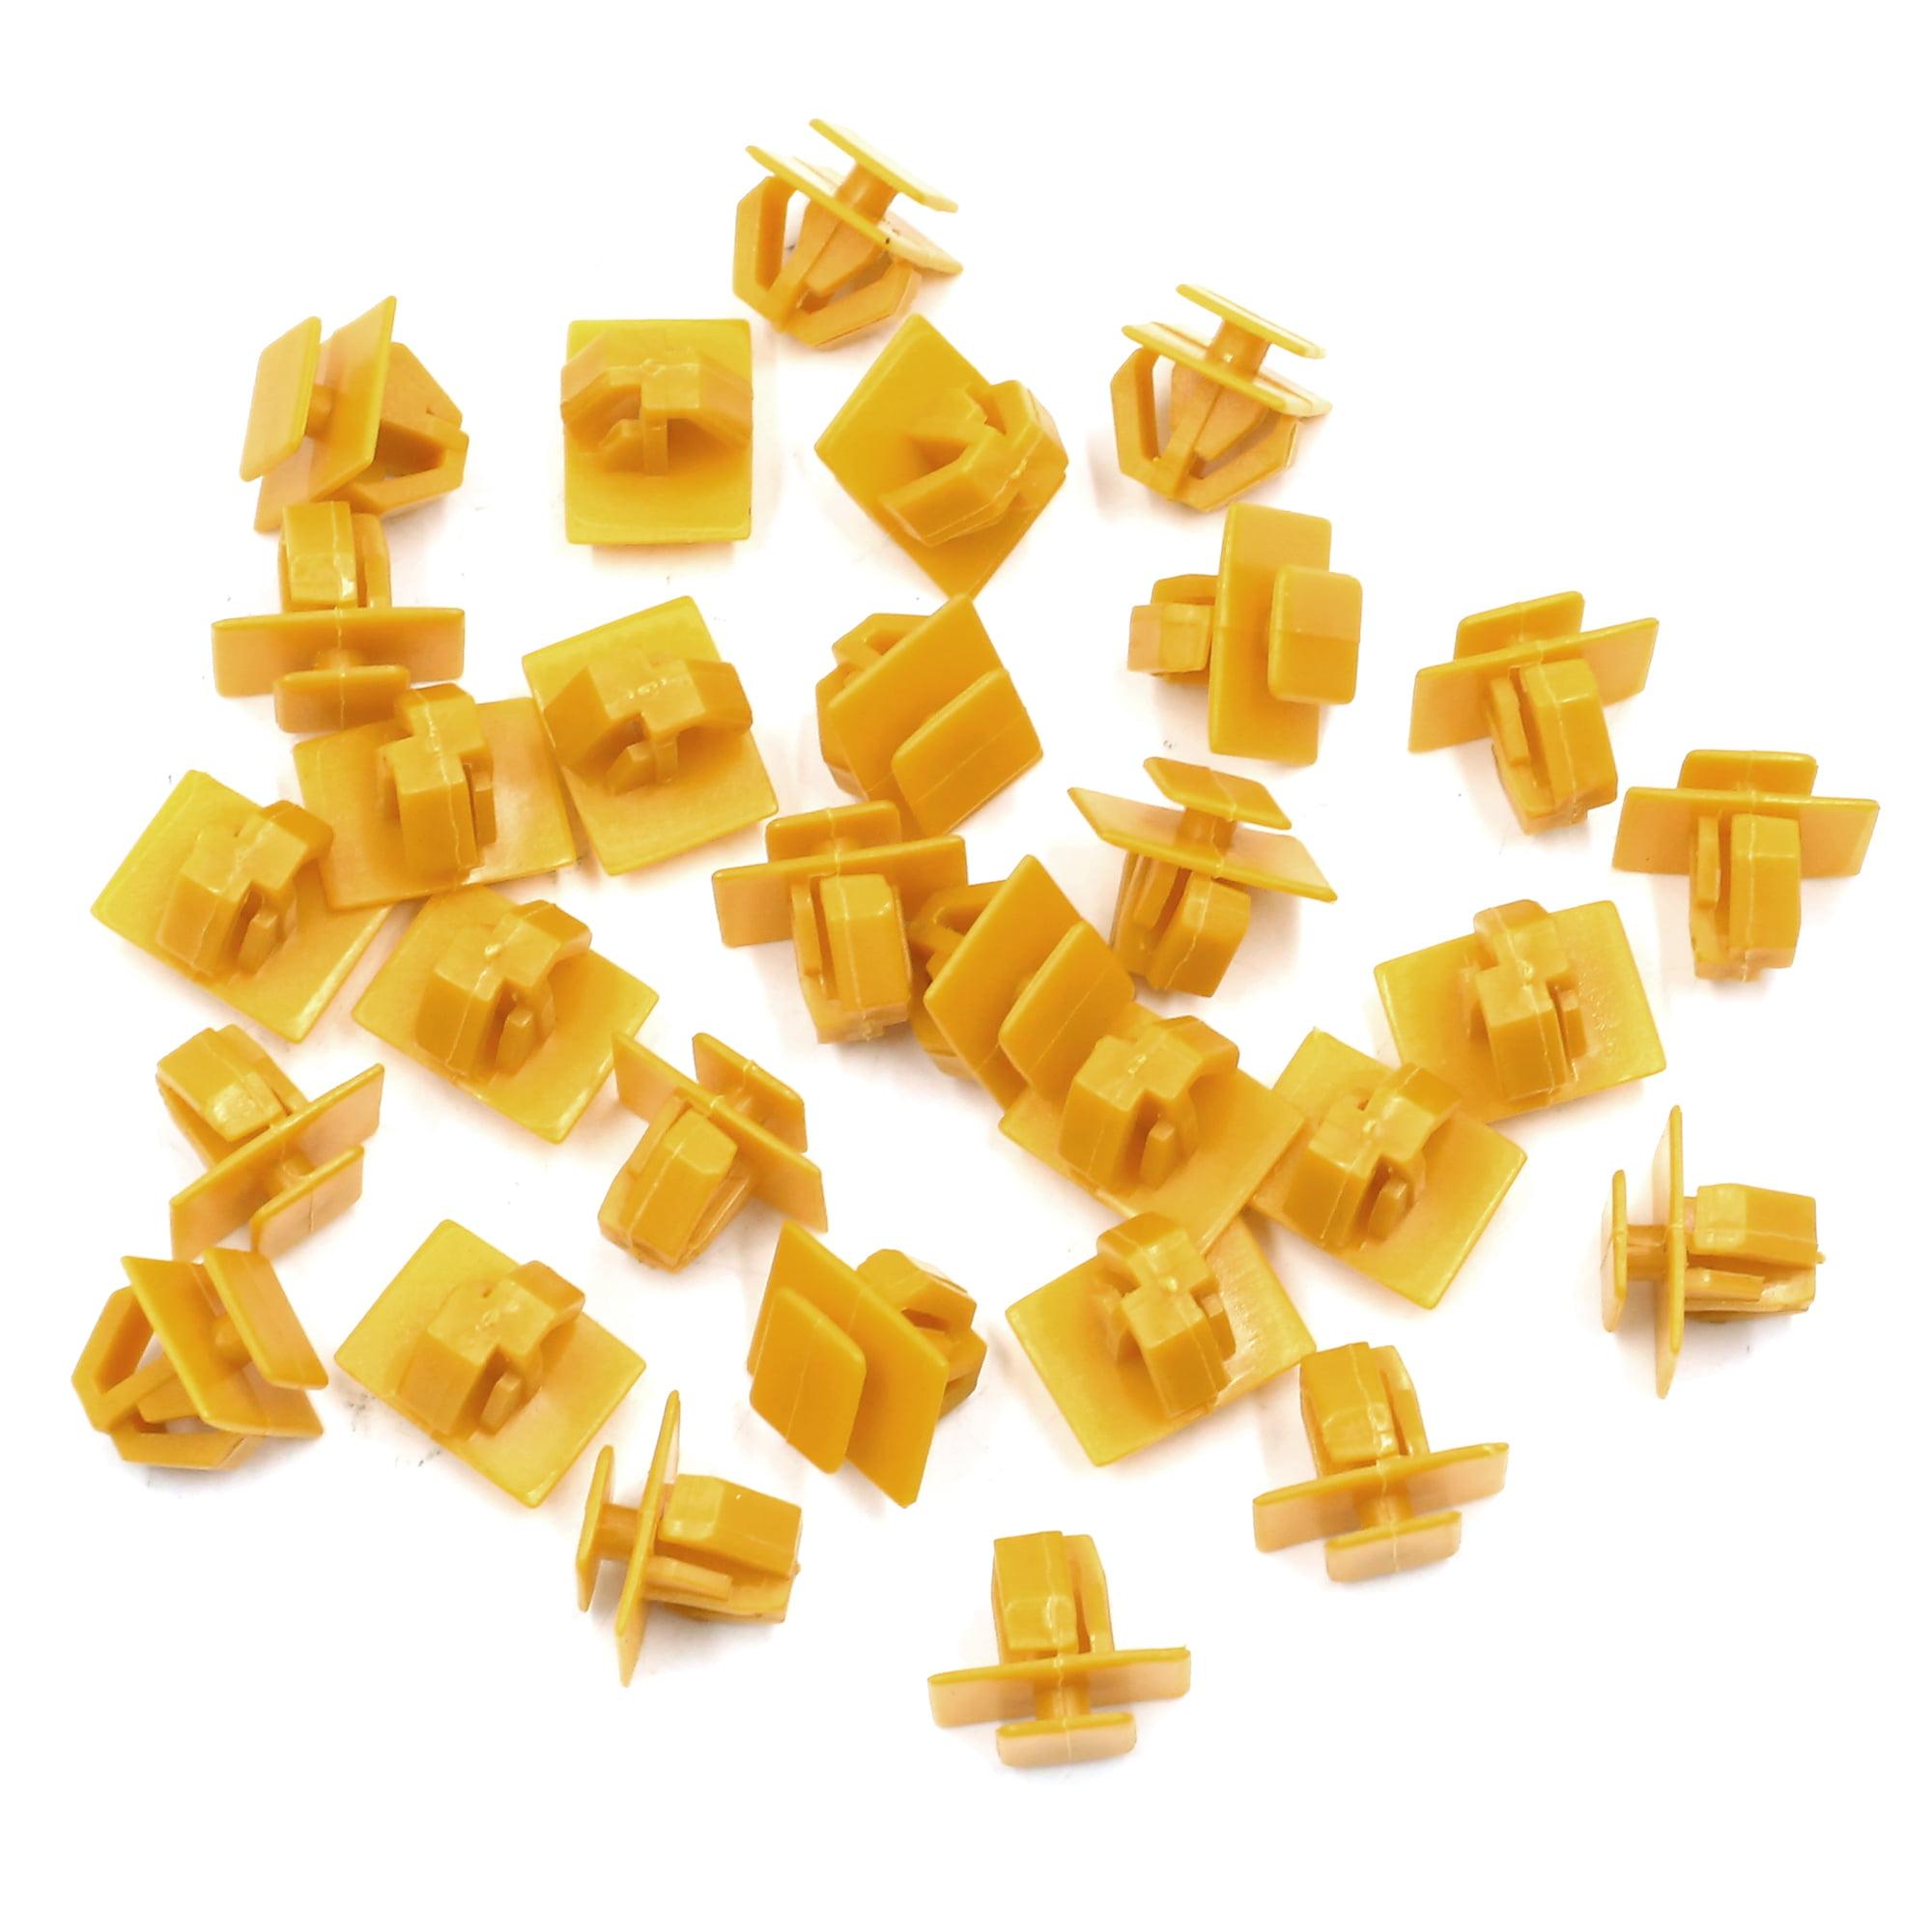 30pcs Yellow Car Trim Door Panel Retainers Bumper Fender Plastic Rivets Clips - image 2 of 2